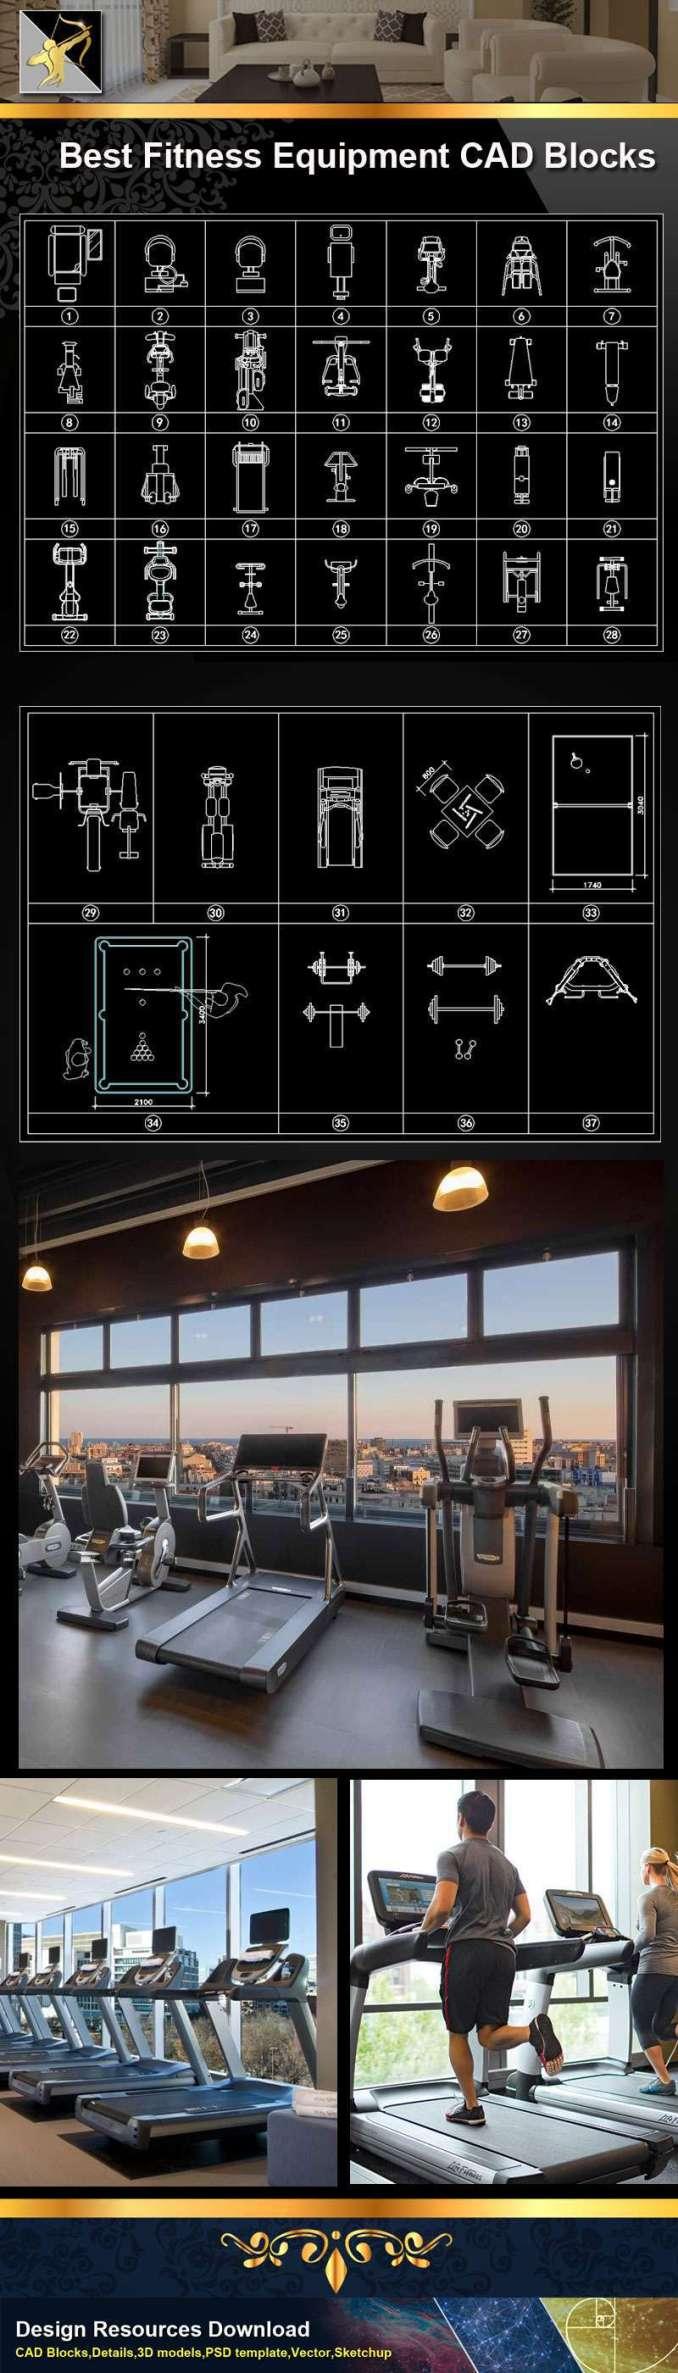 ☆【fitness equipment】@autocad blocks drawings cad details